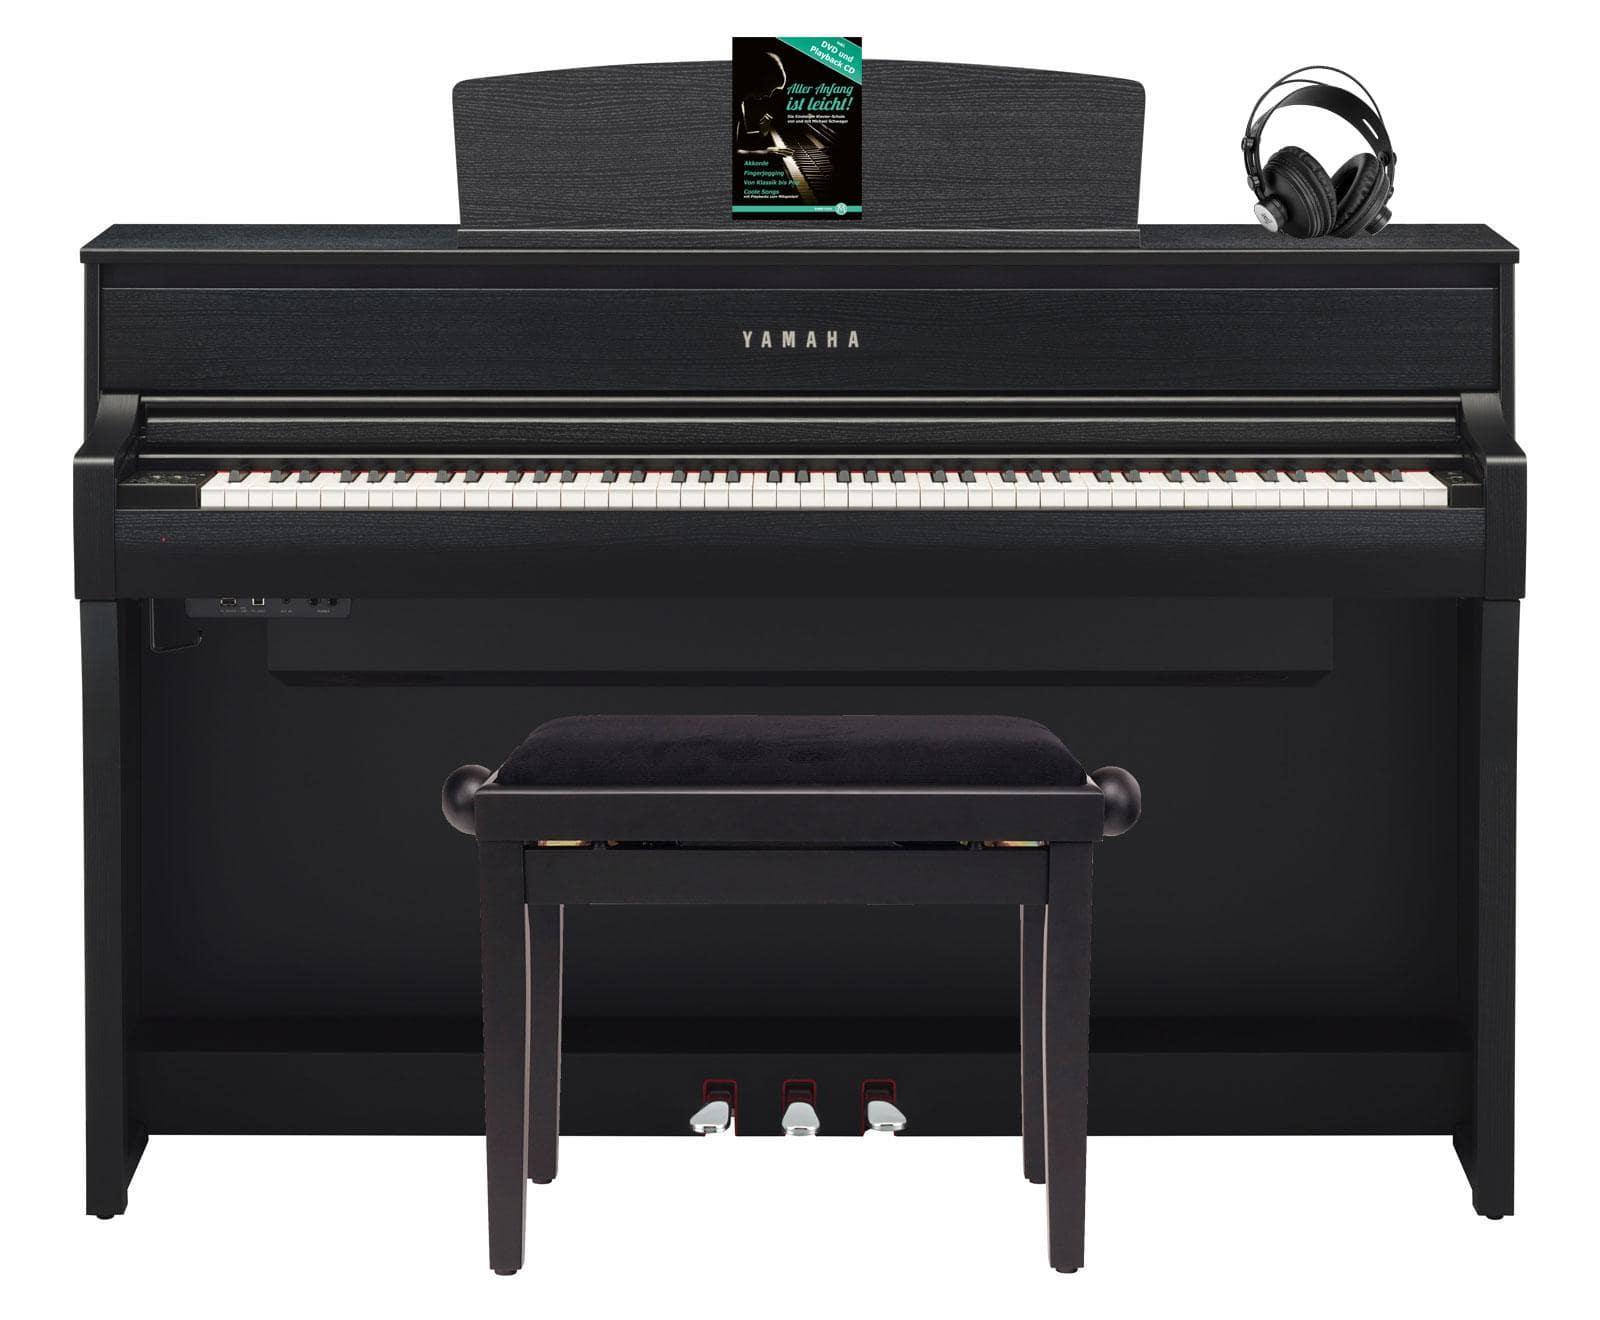 Yamaha clp 675 b digitalpiano schwarznuss set mit for Yamaha clp 675